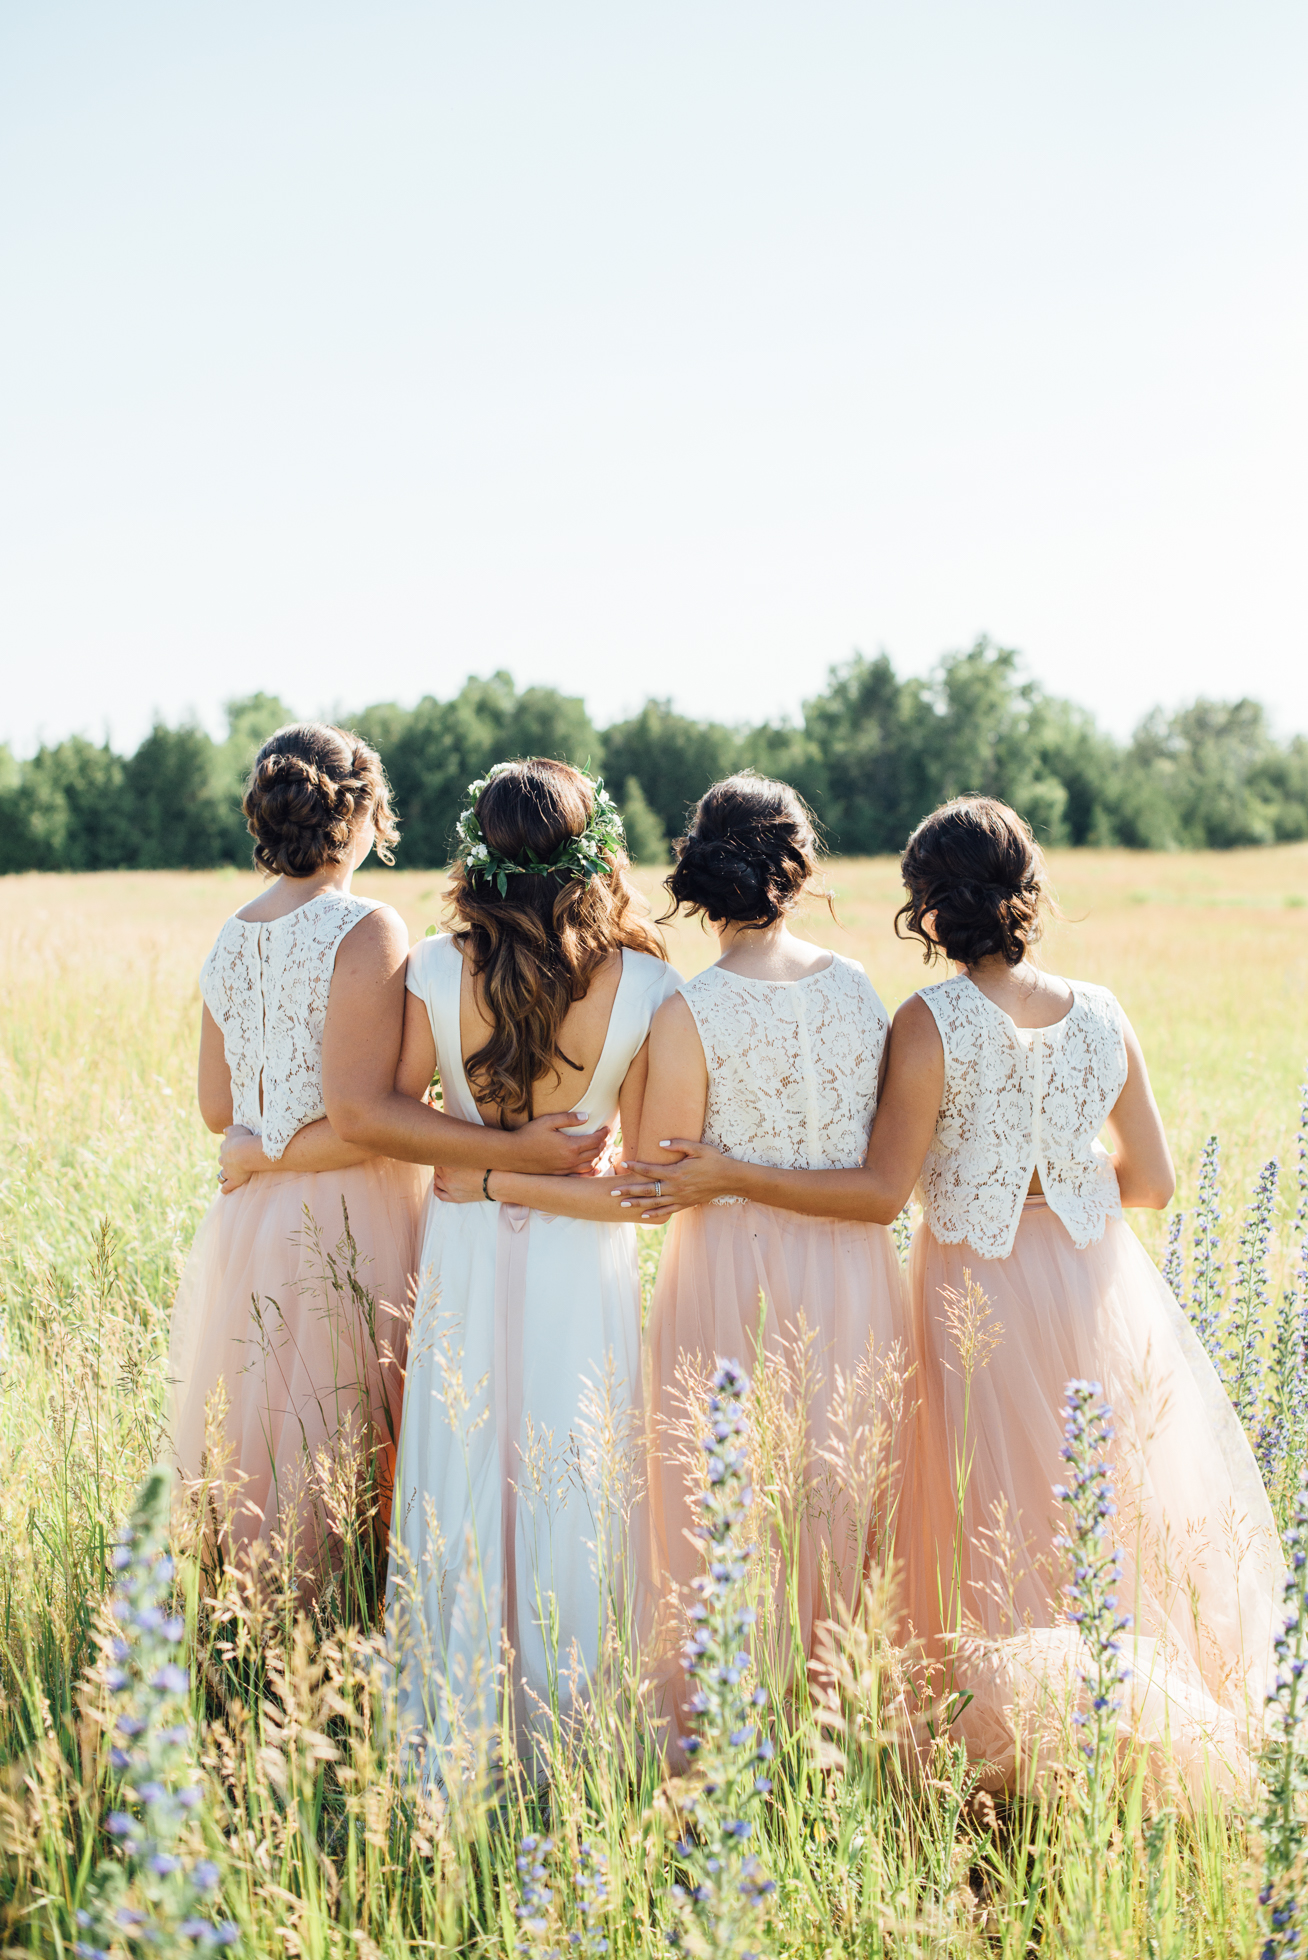 Downswell-Barn-Wedding-Photography-72.jpg